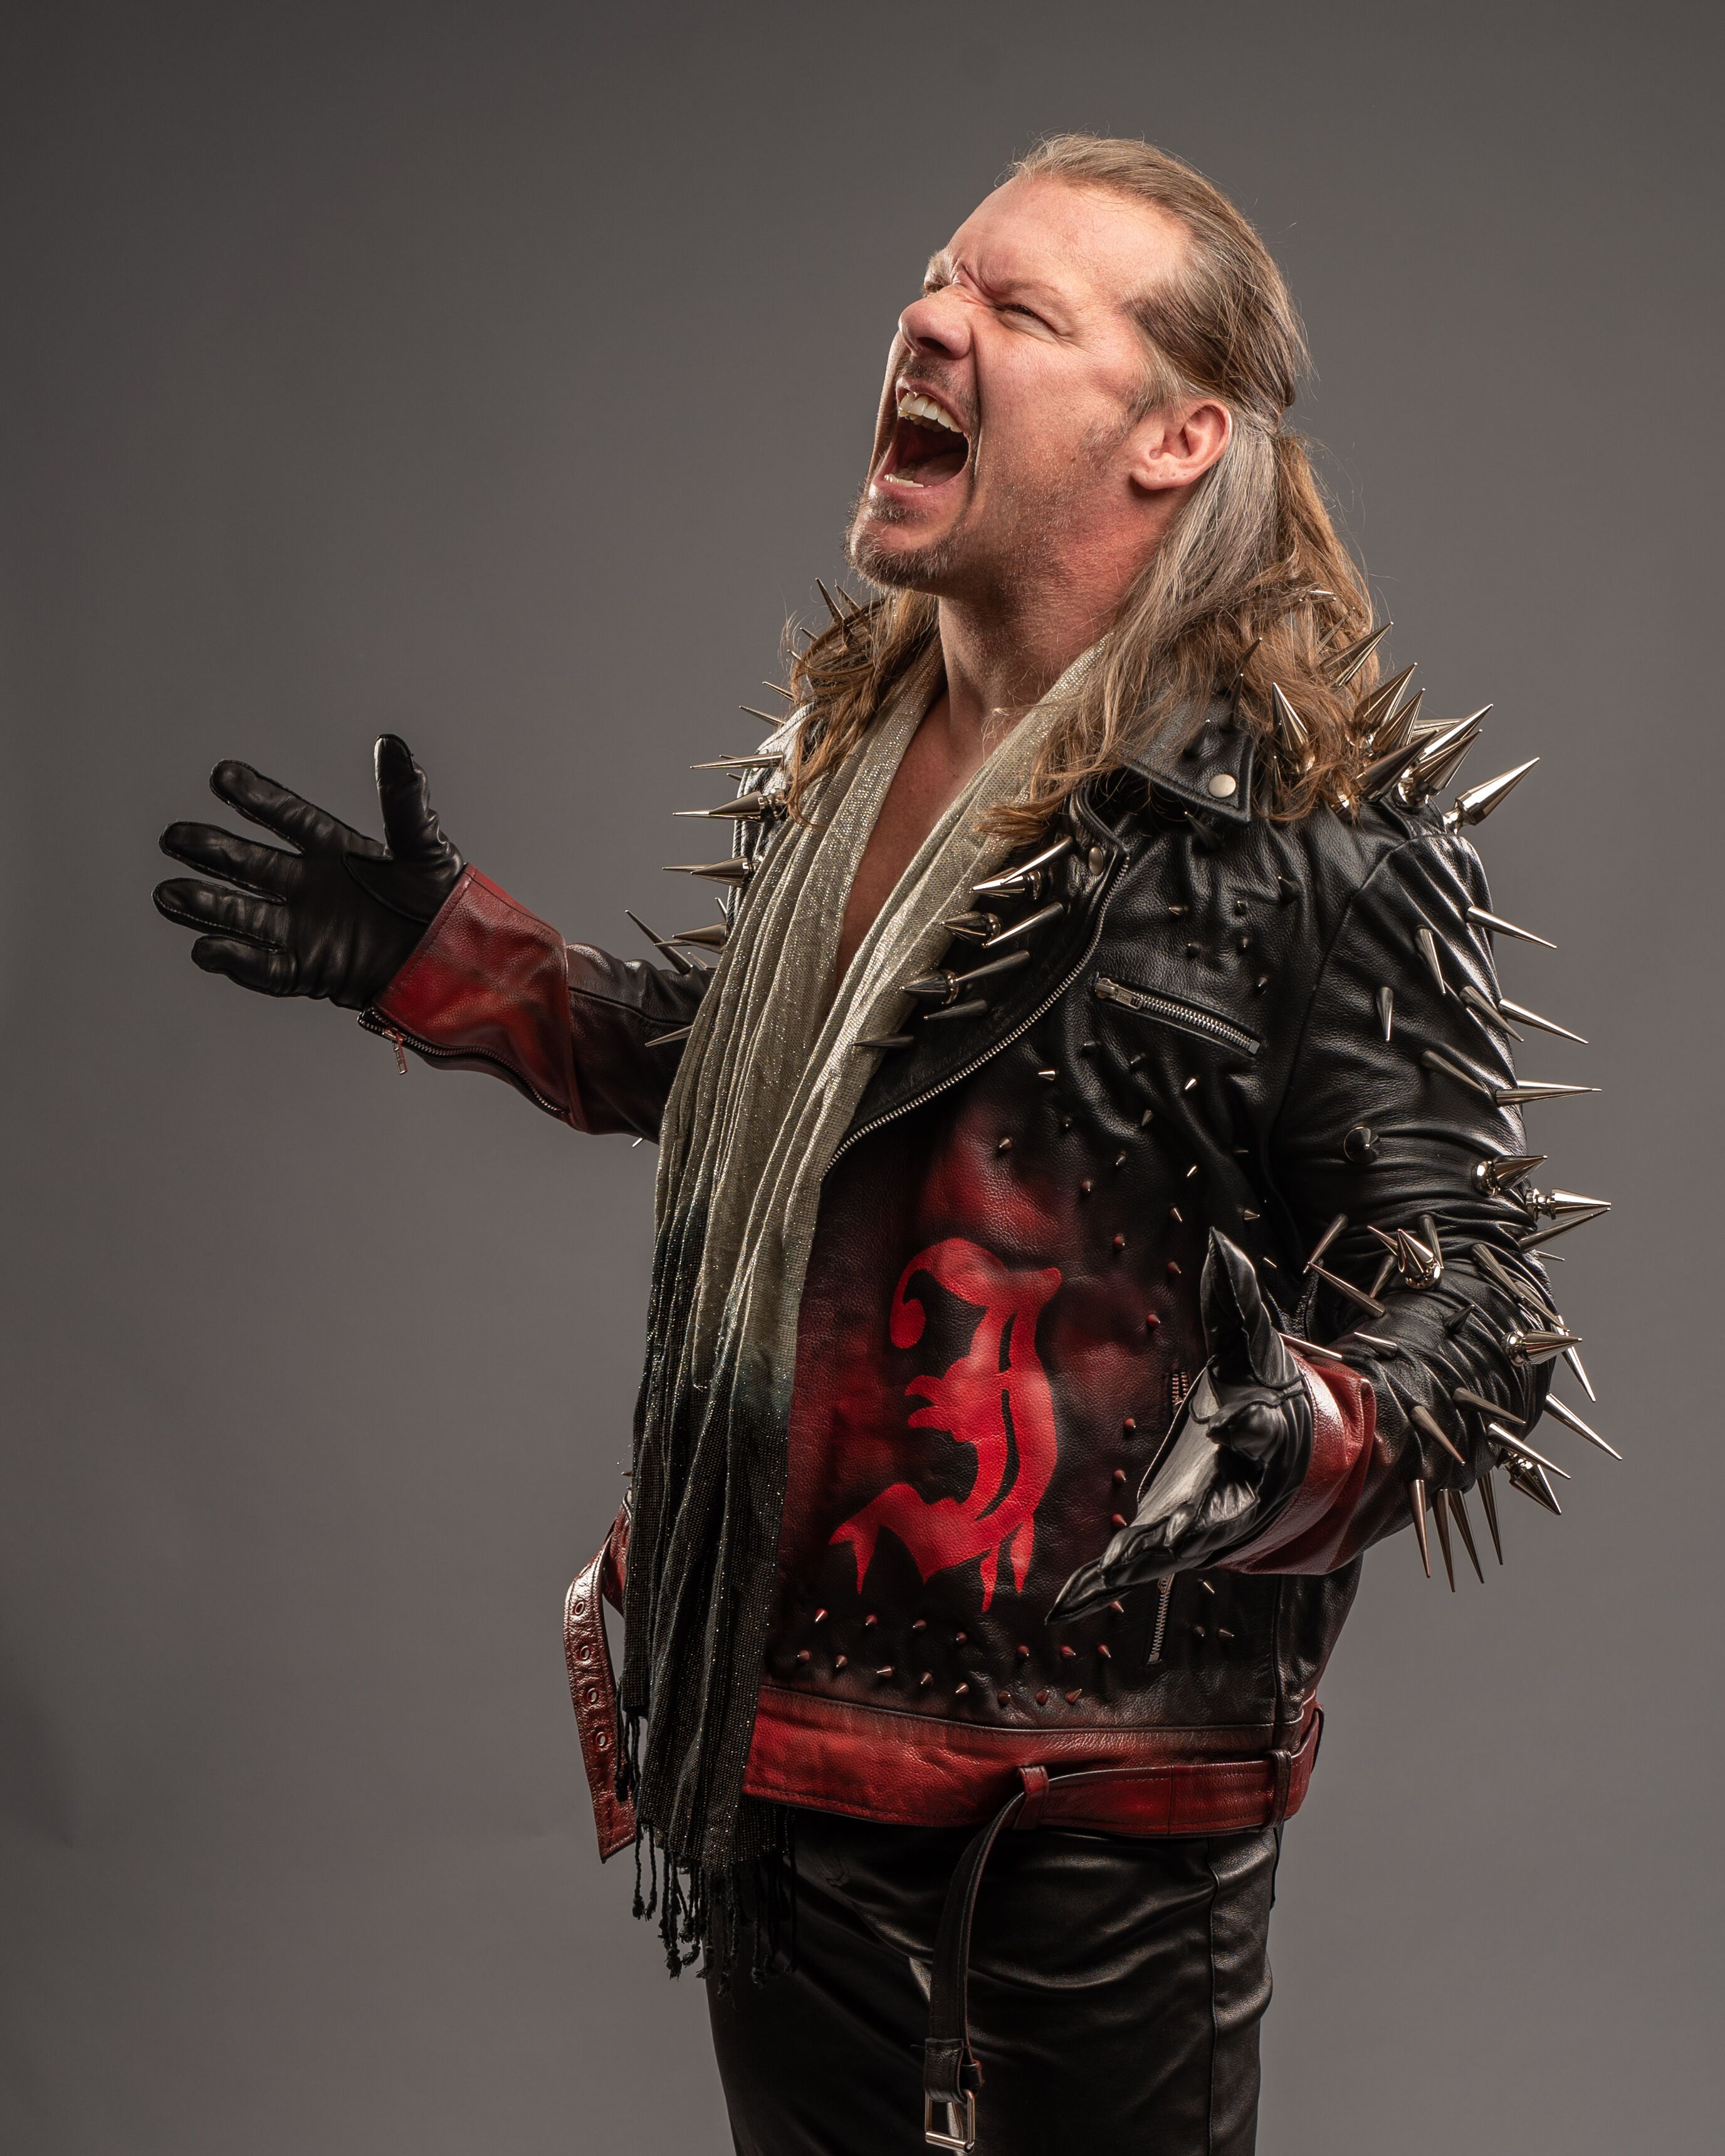 Chris Jericho's AEW Championship belt disappears